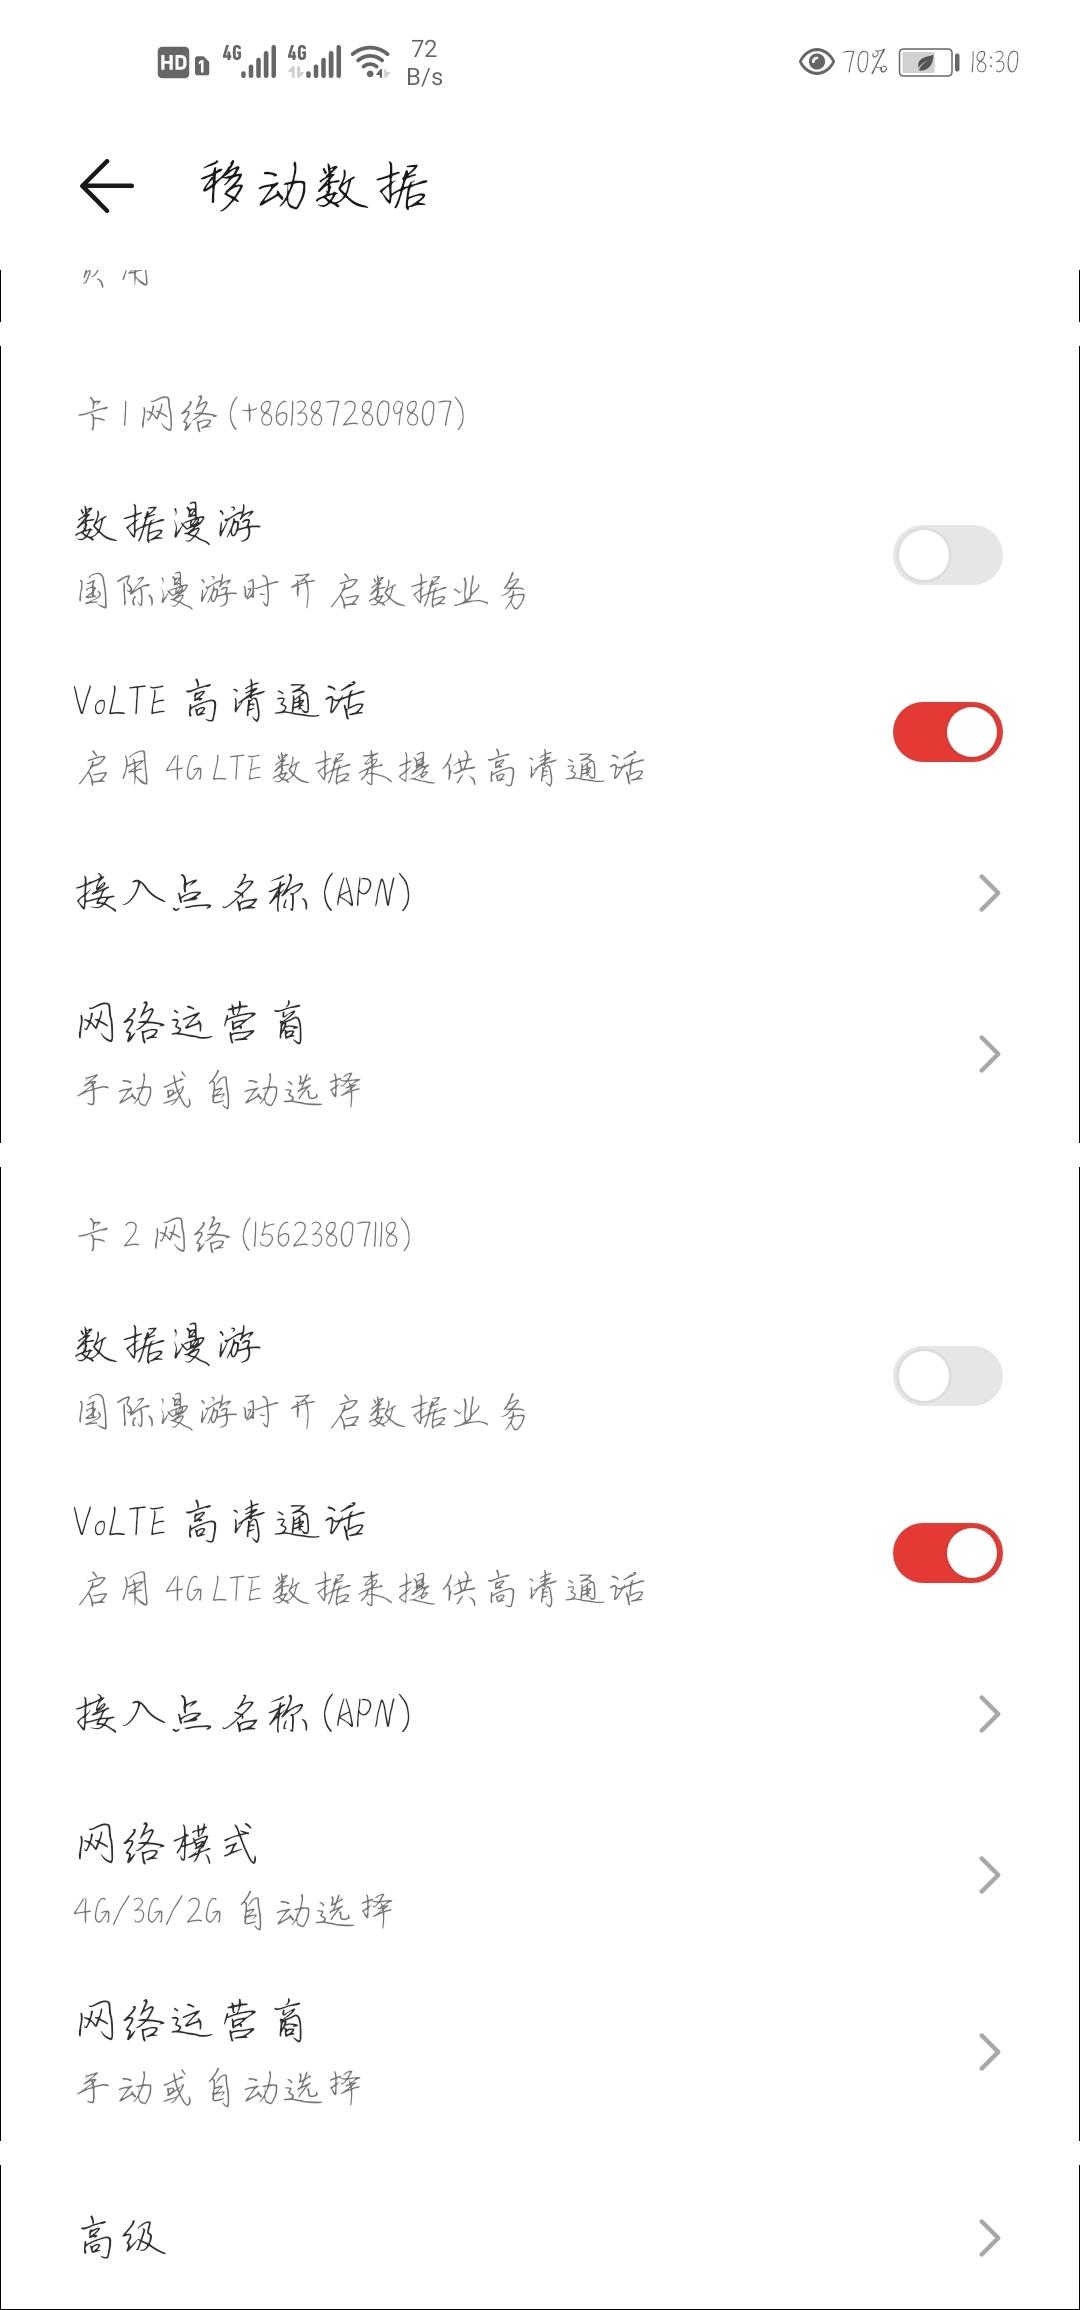 Screenshot_20200517_183046_com.android.phone.jpg